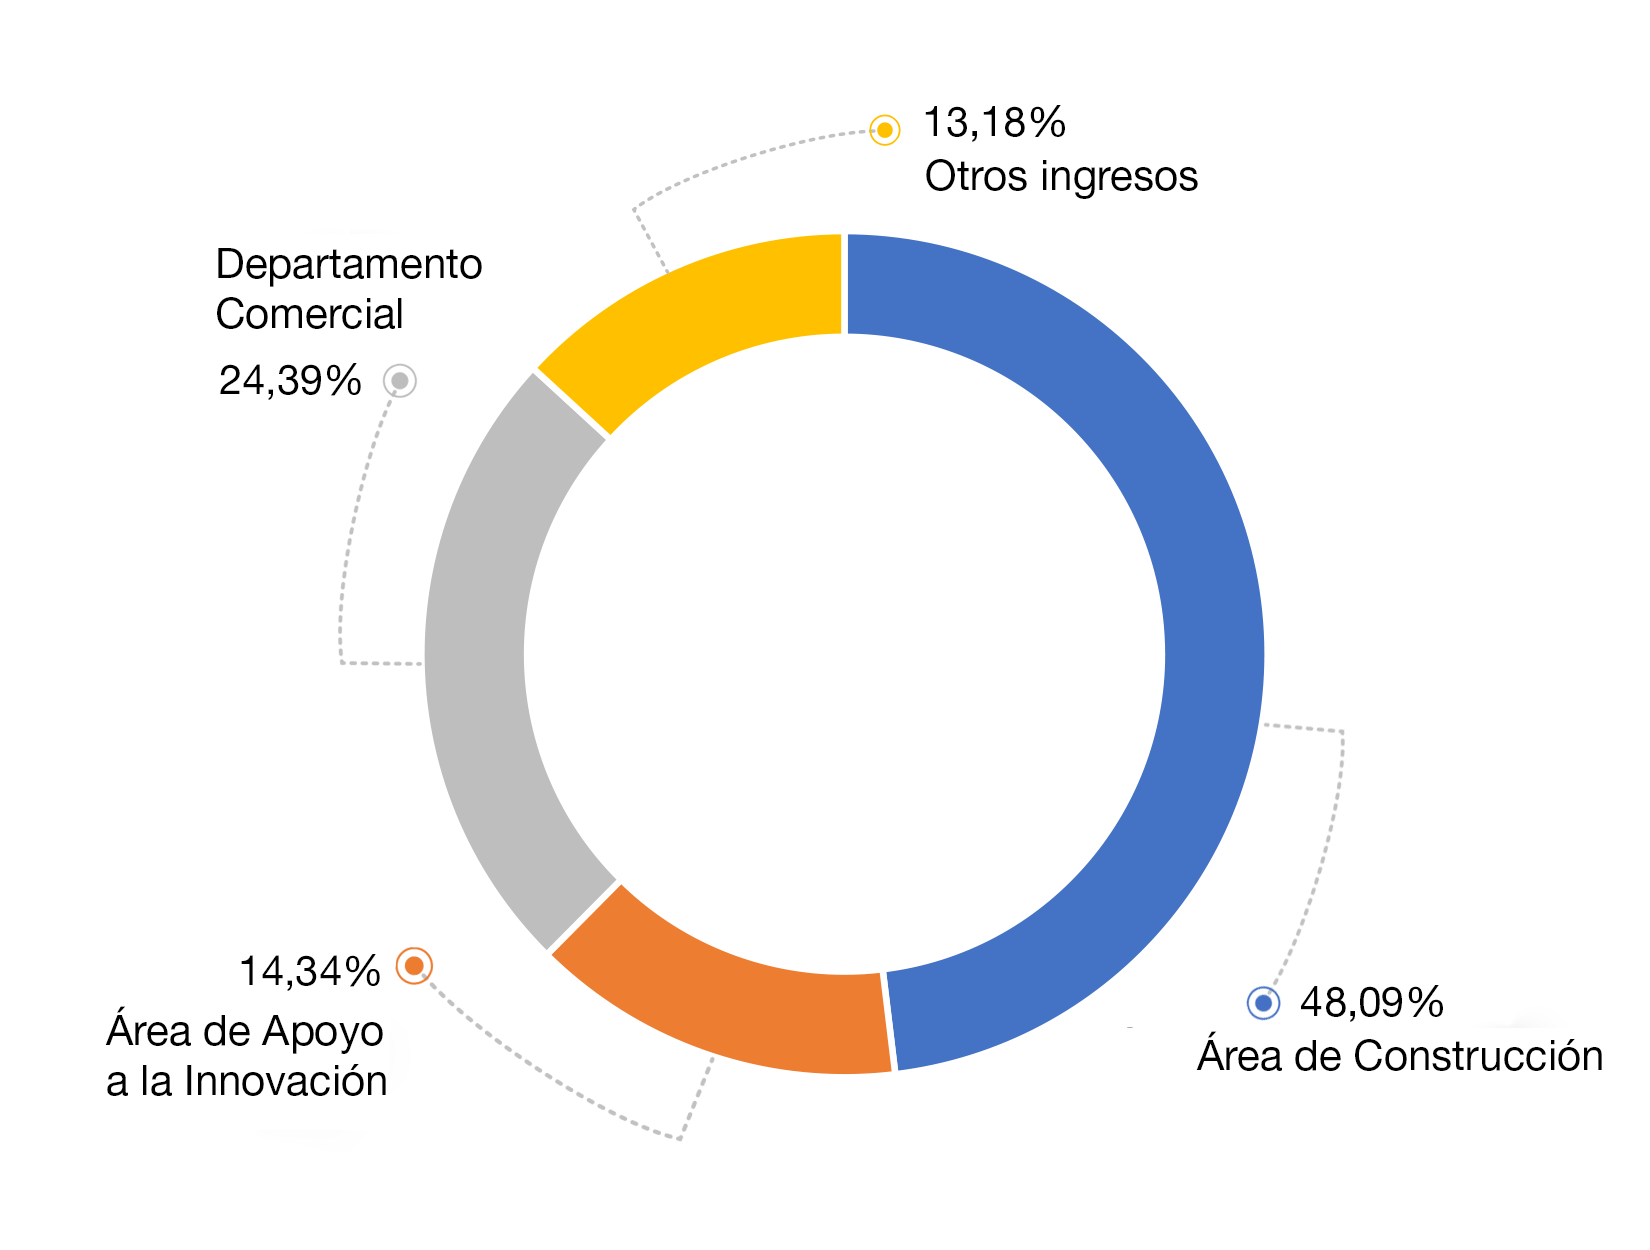 diagrama-sectores-2016-ingresos